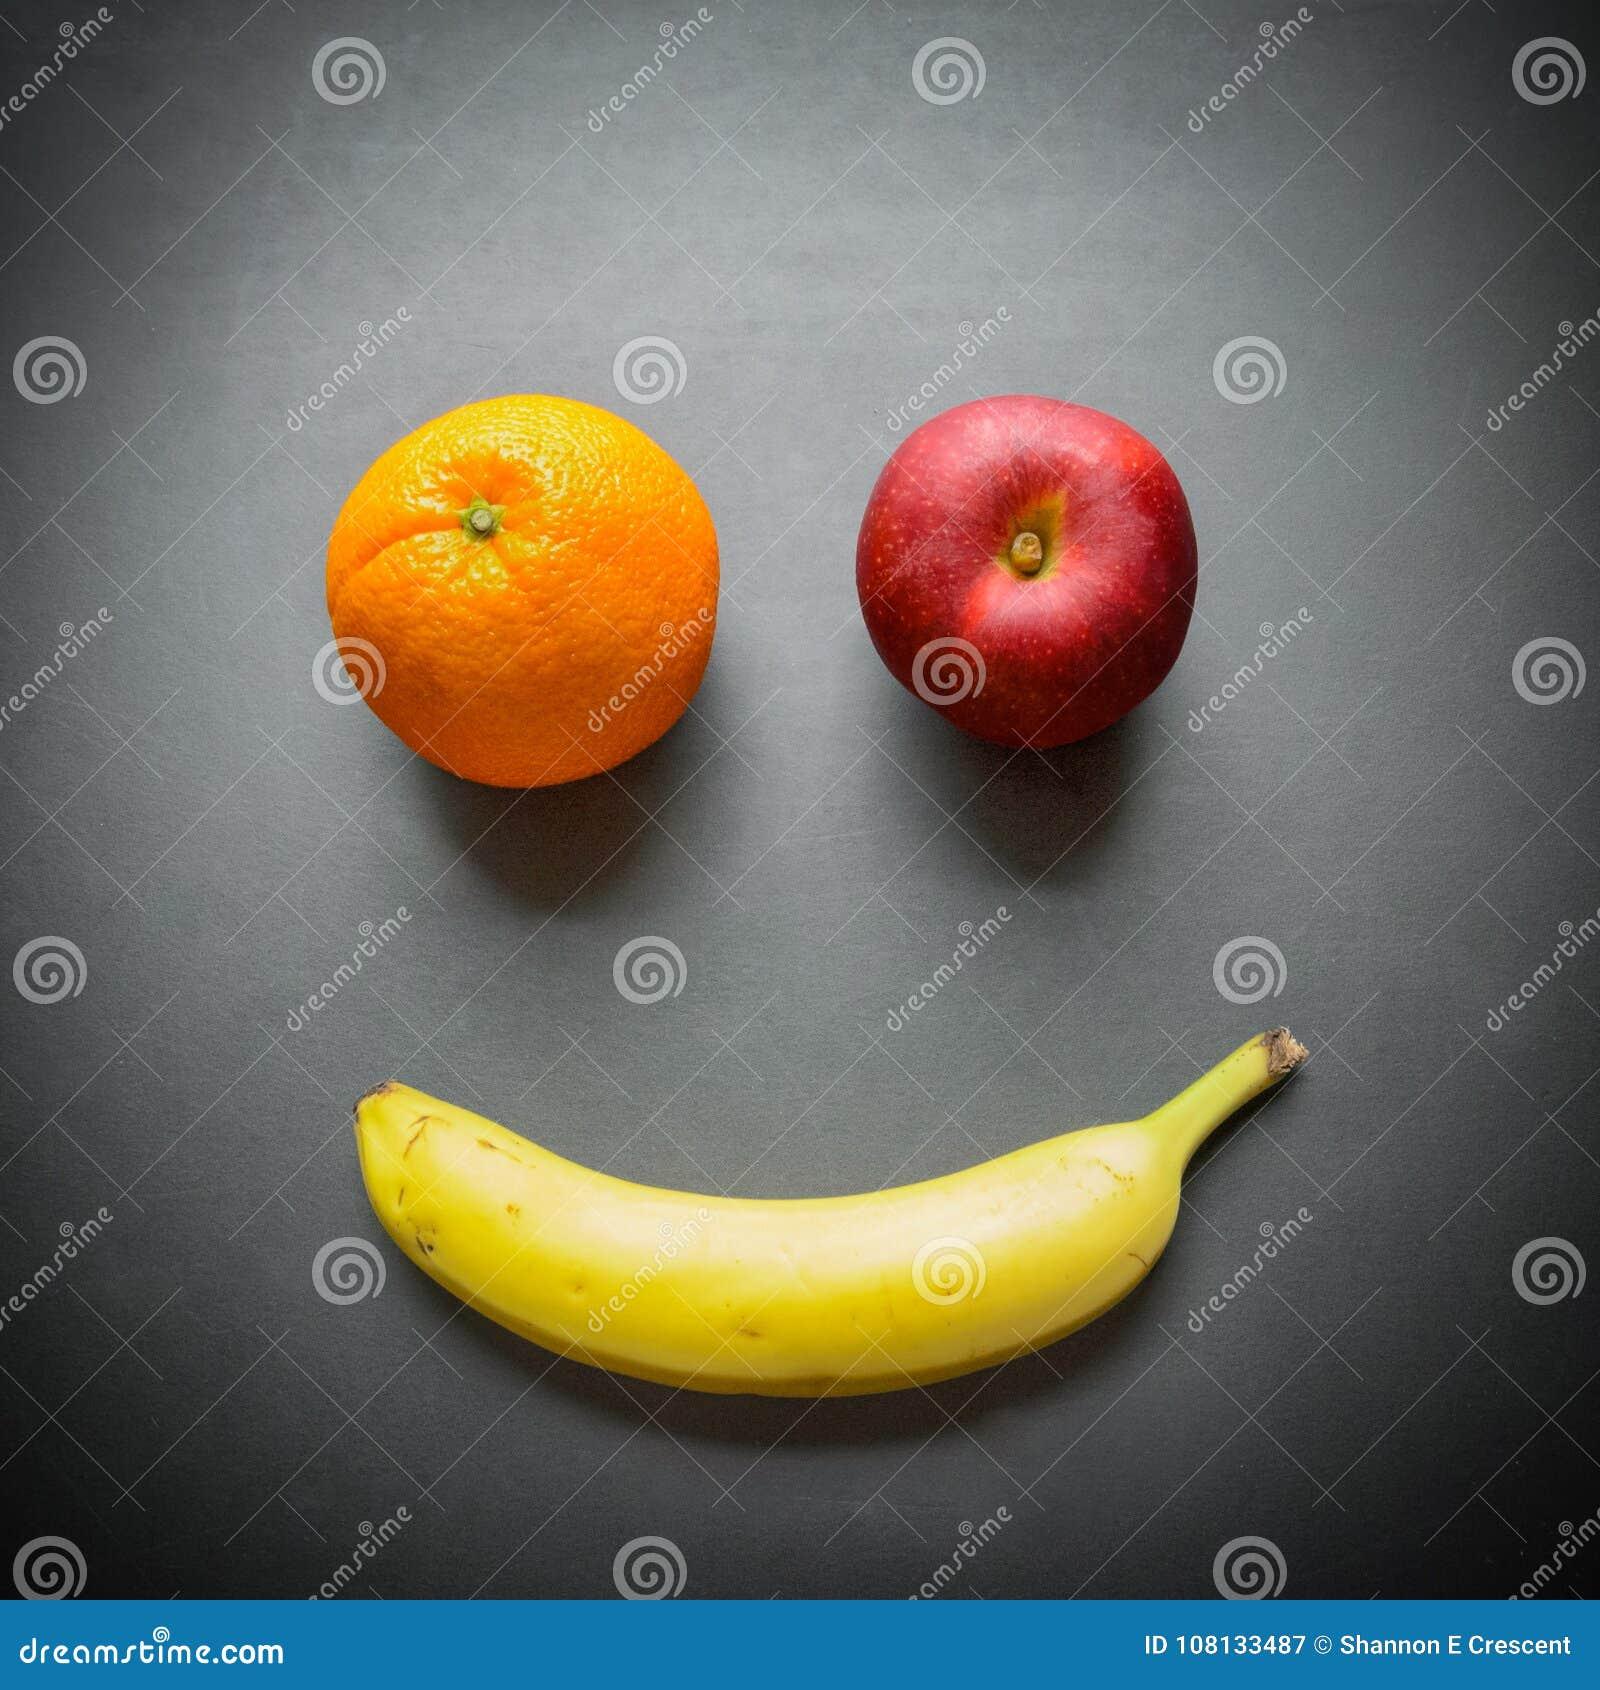 Apple, banana, and orange as a smiley face